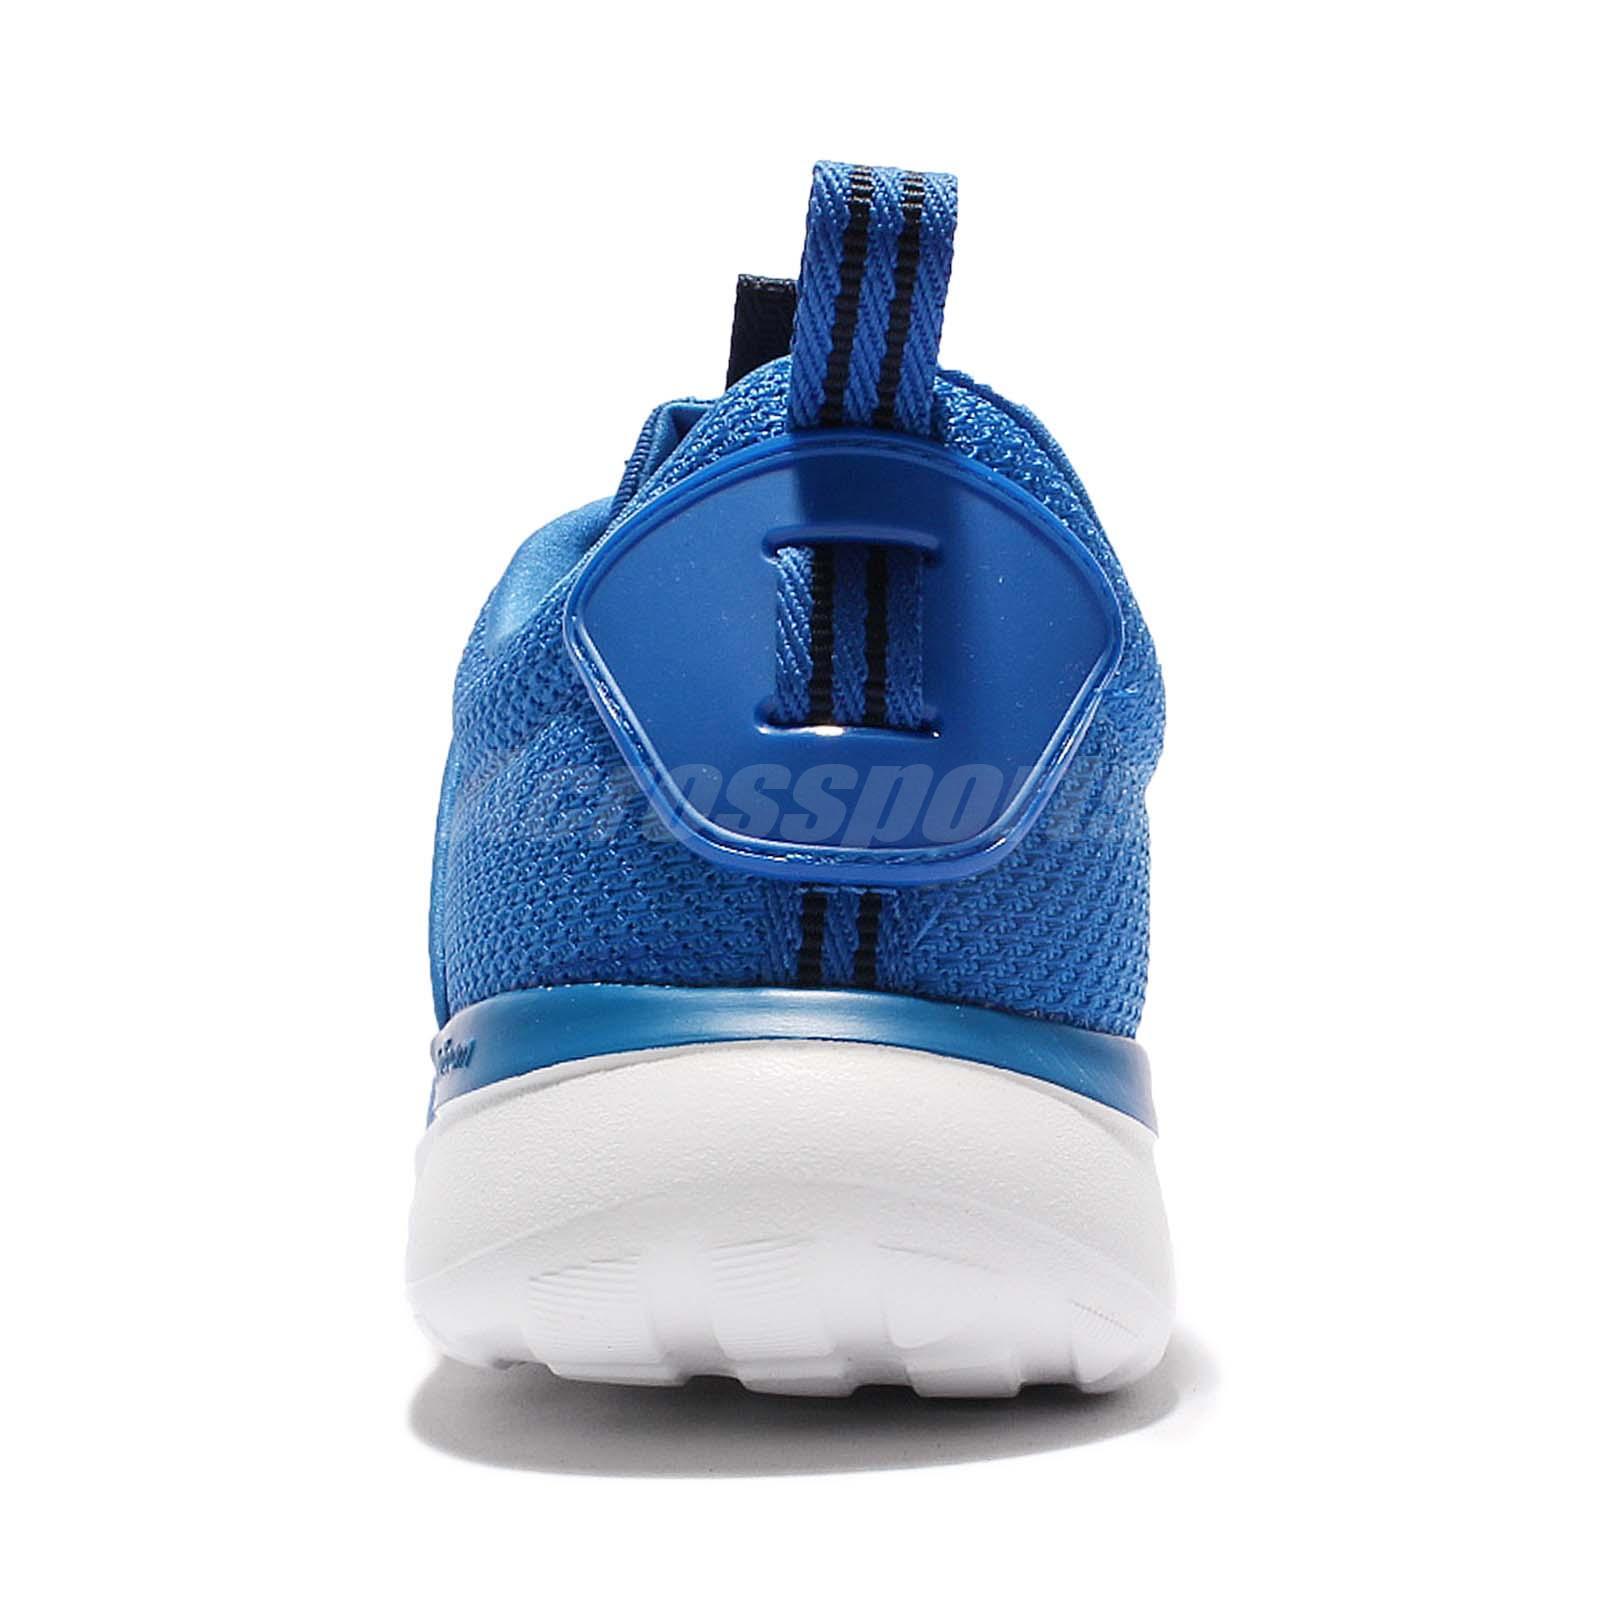 Adidas neo cloudfoam Lite Racer azul blanco Hombres Zapatillas